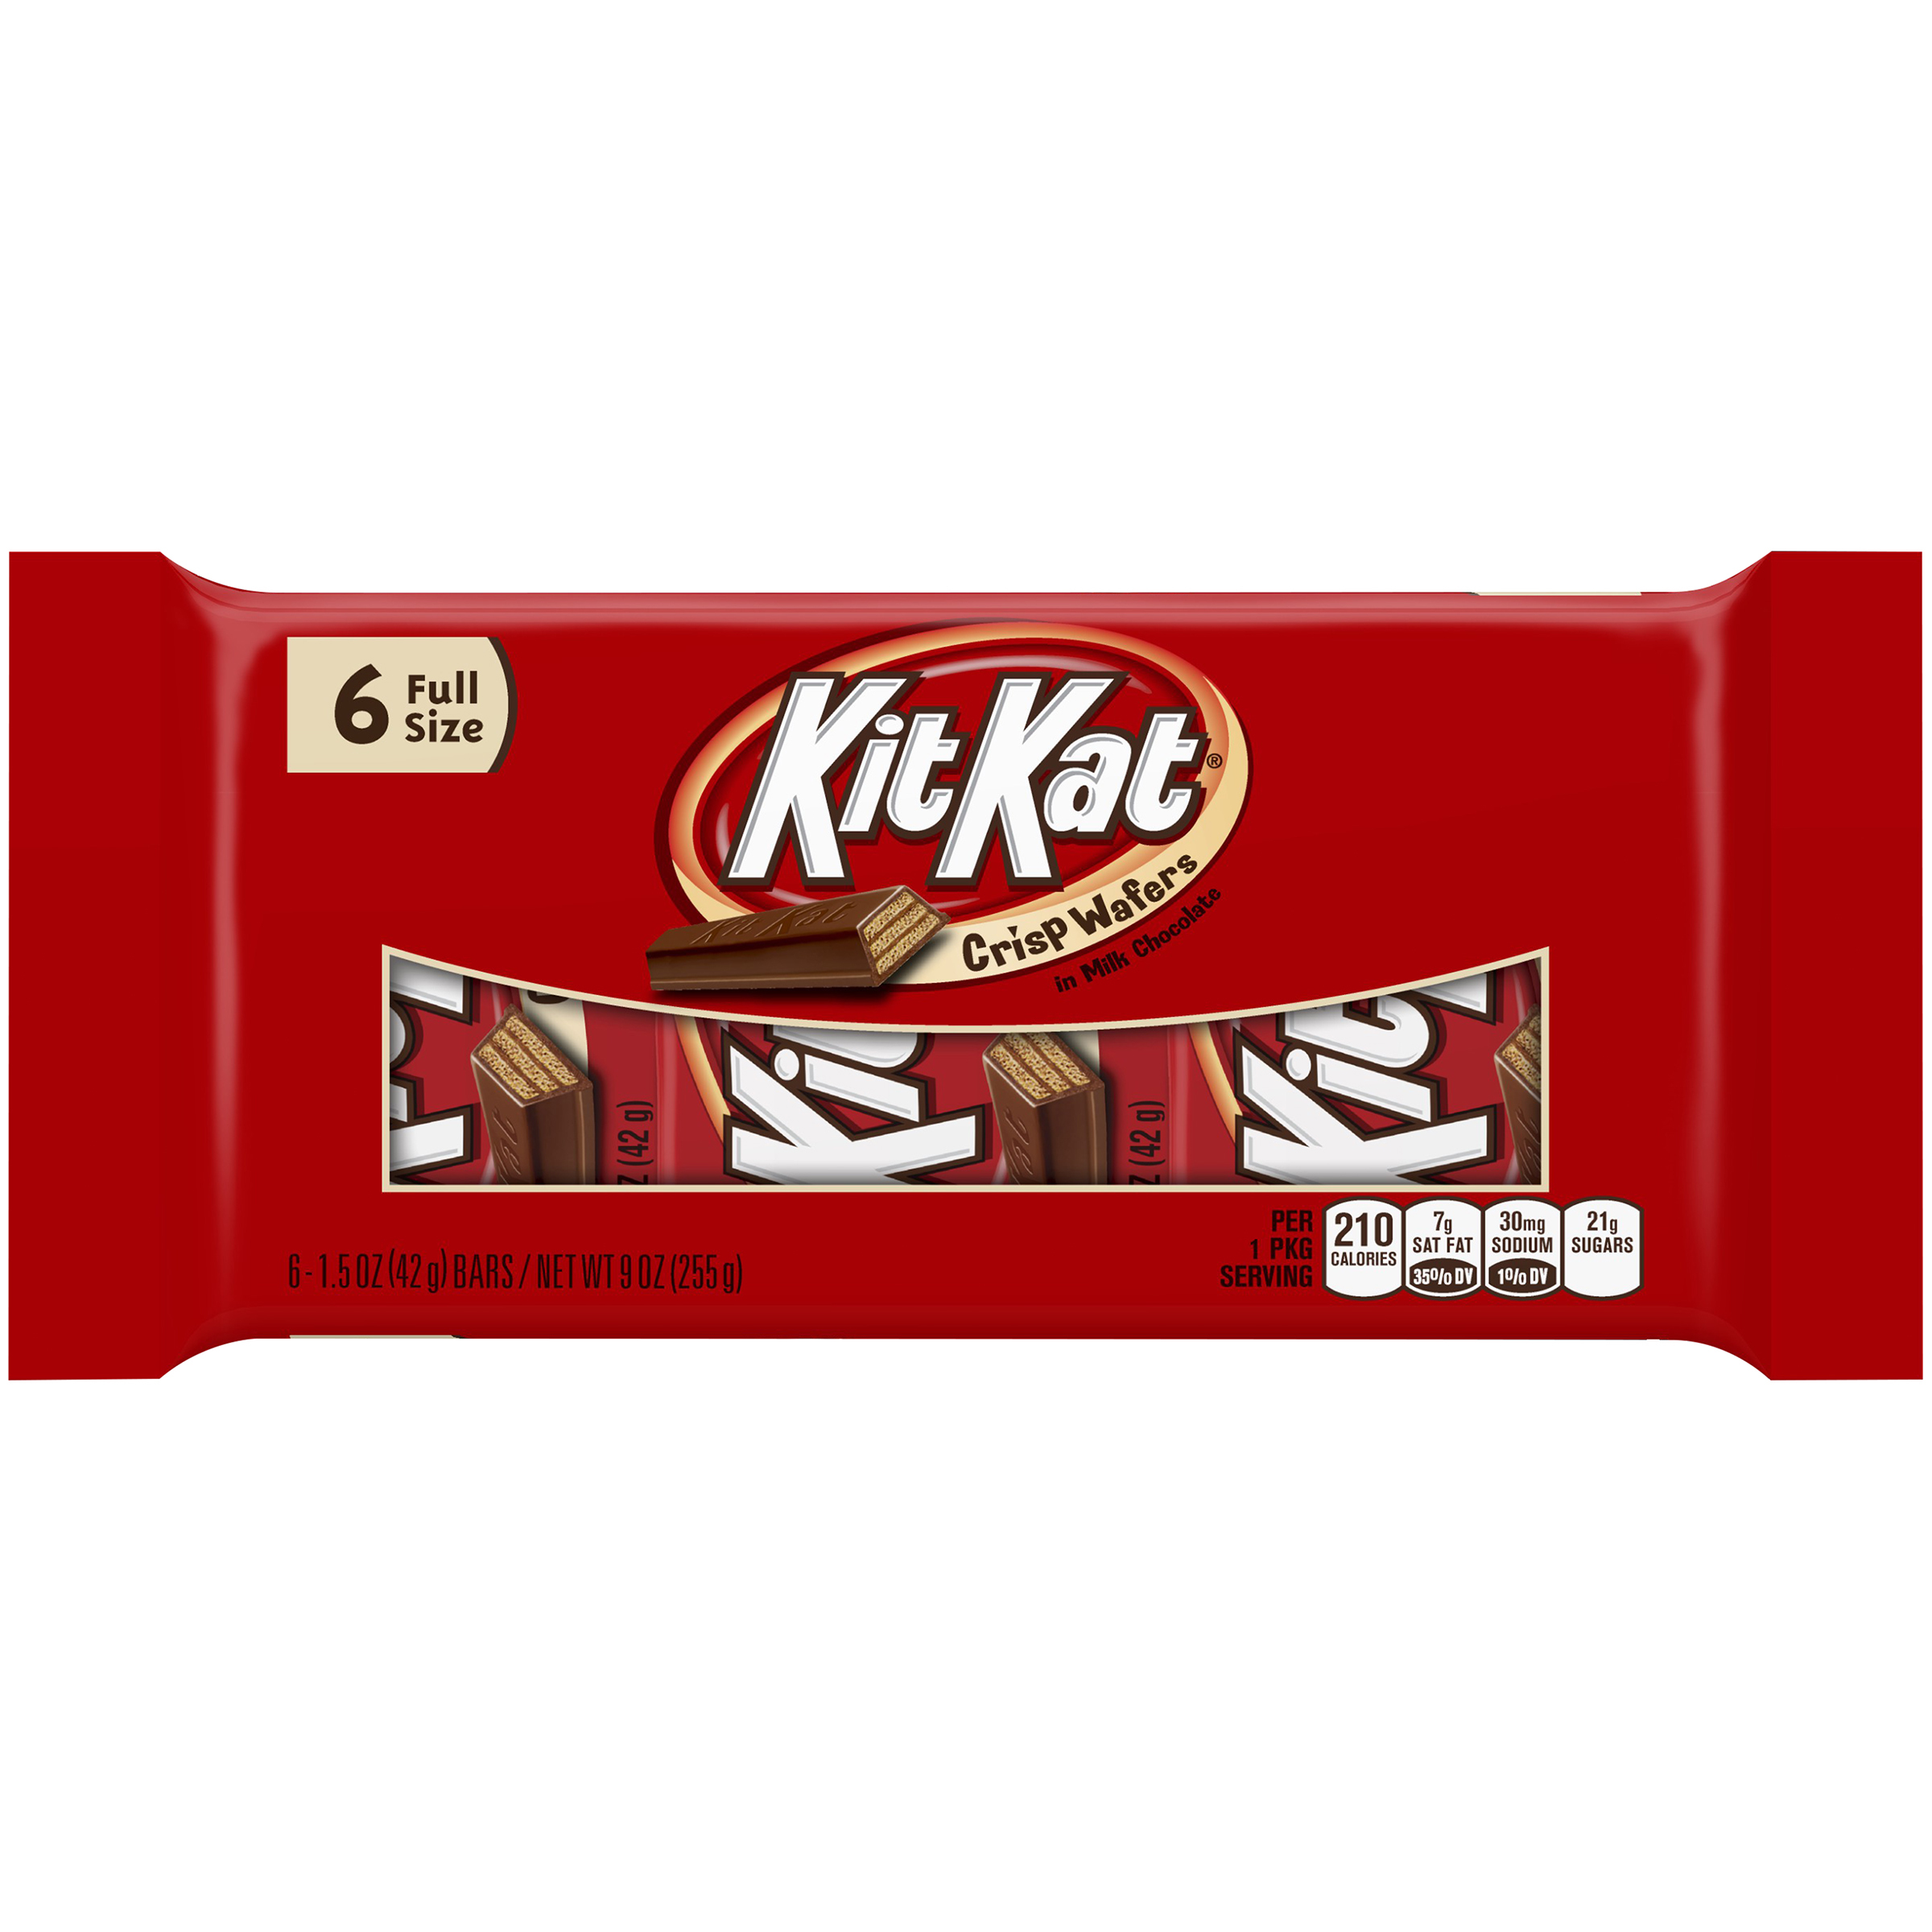 Kit Kat, Crisp Wafer Milk Chocolate Candy Bars Snack Size, 9 Oz